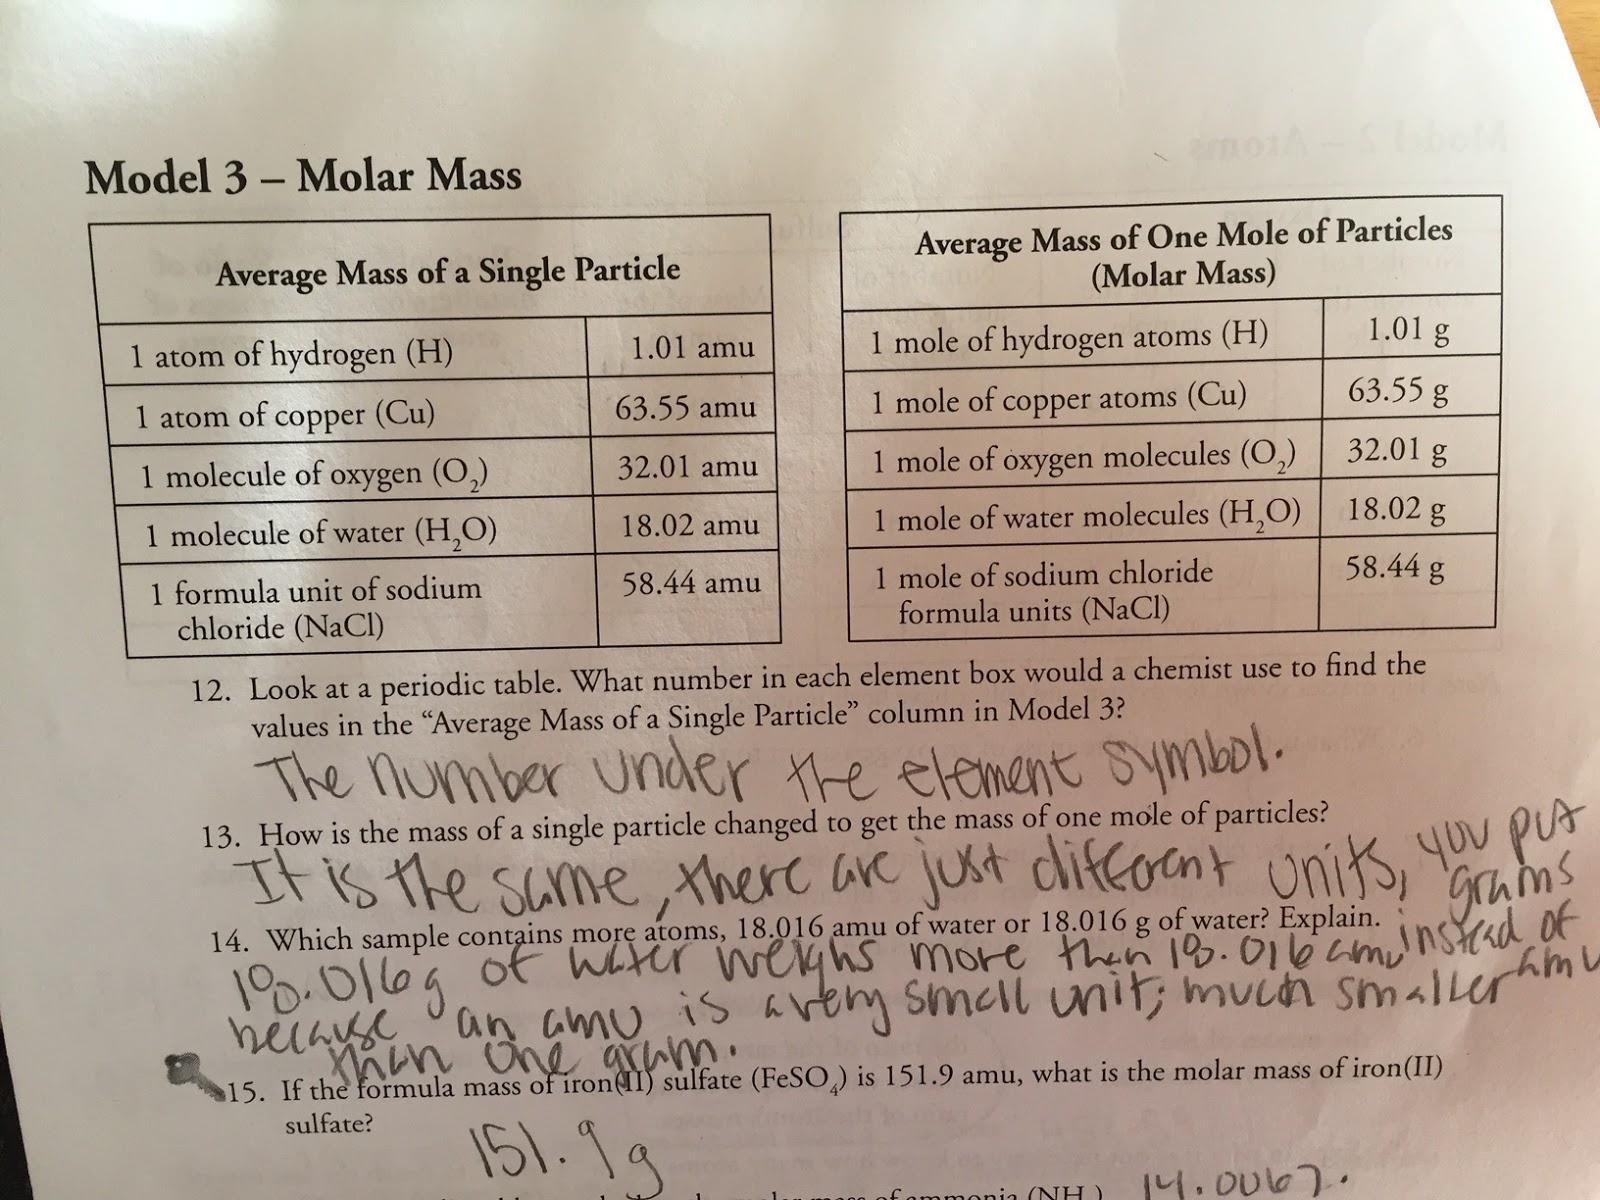 Maya S Chem 2a 5th Hour Blog October